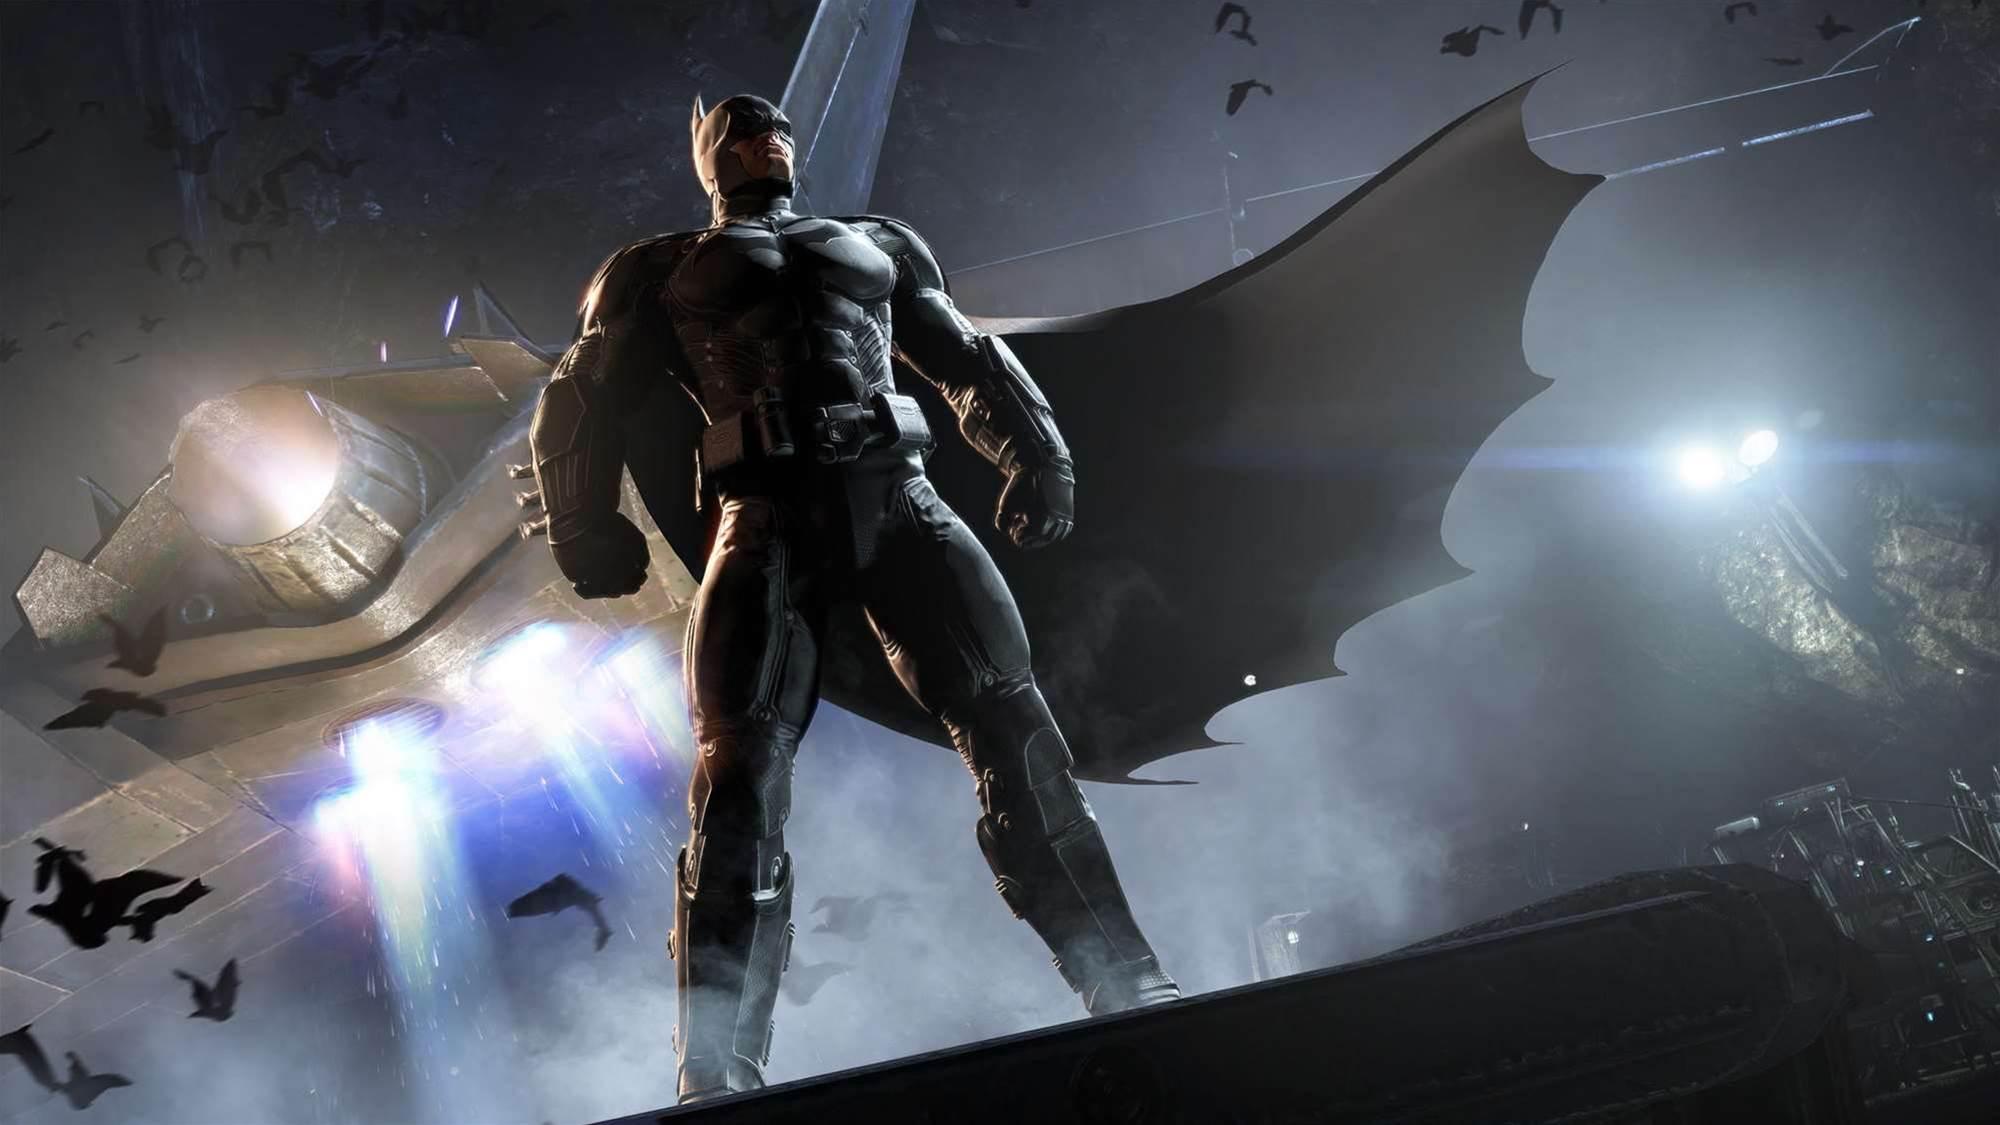 WB Games Montreal hints at more DC comics games